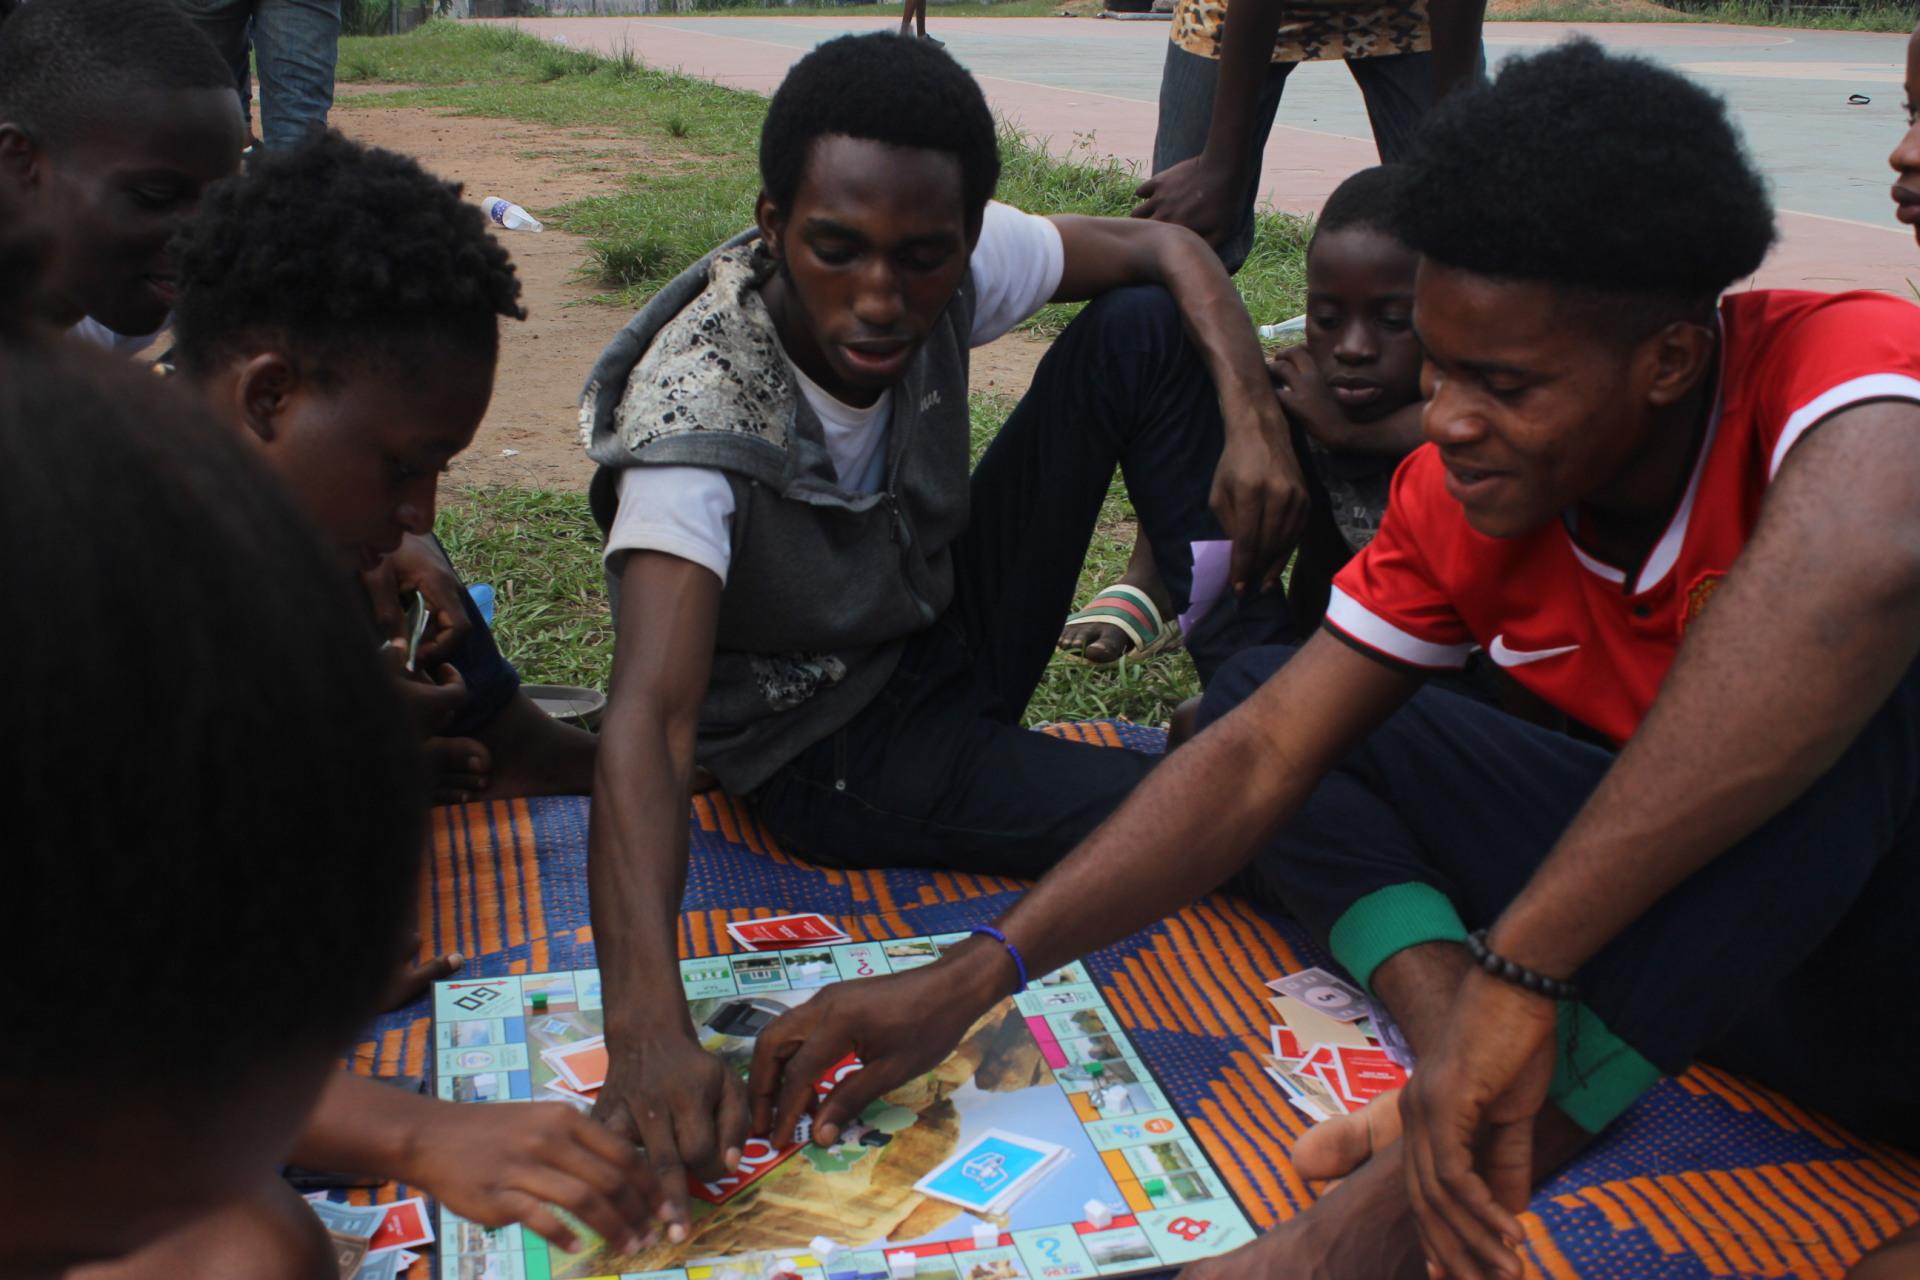 Monopoly team